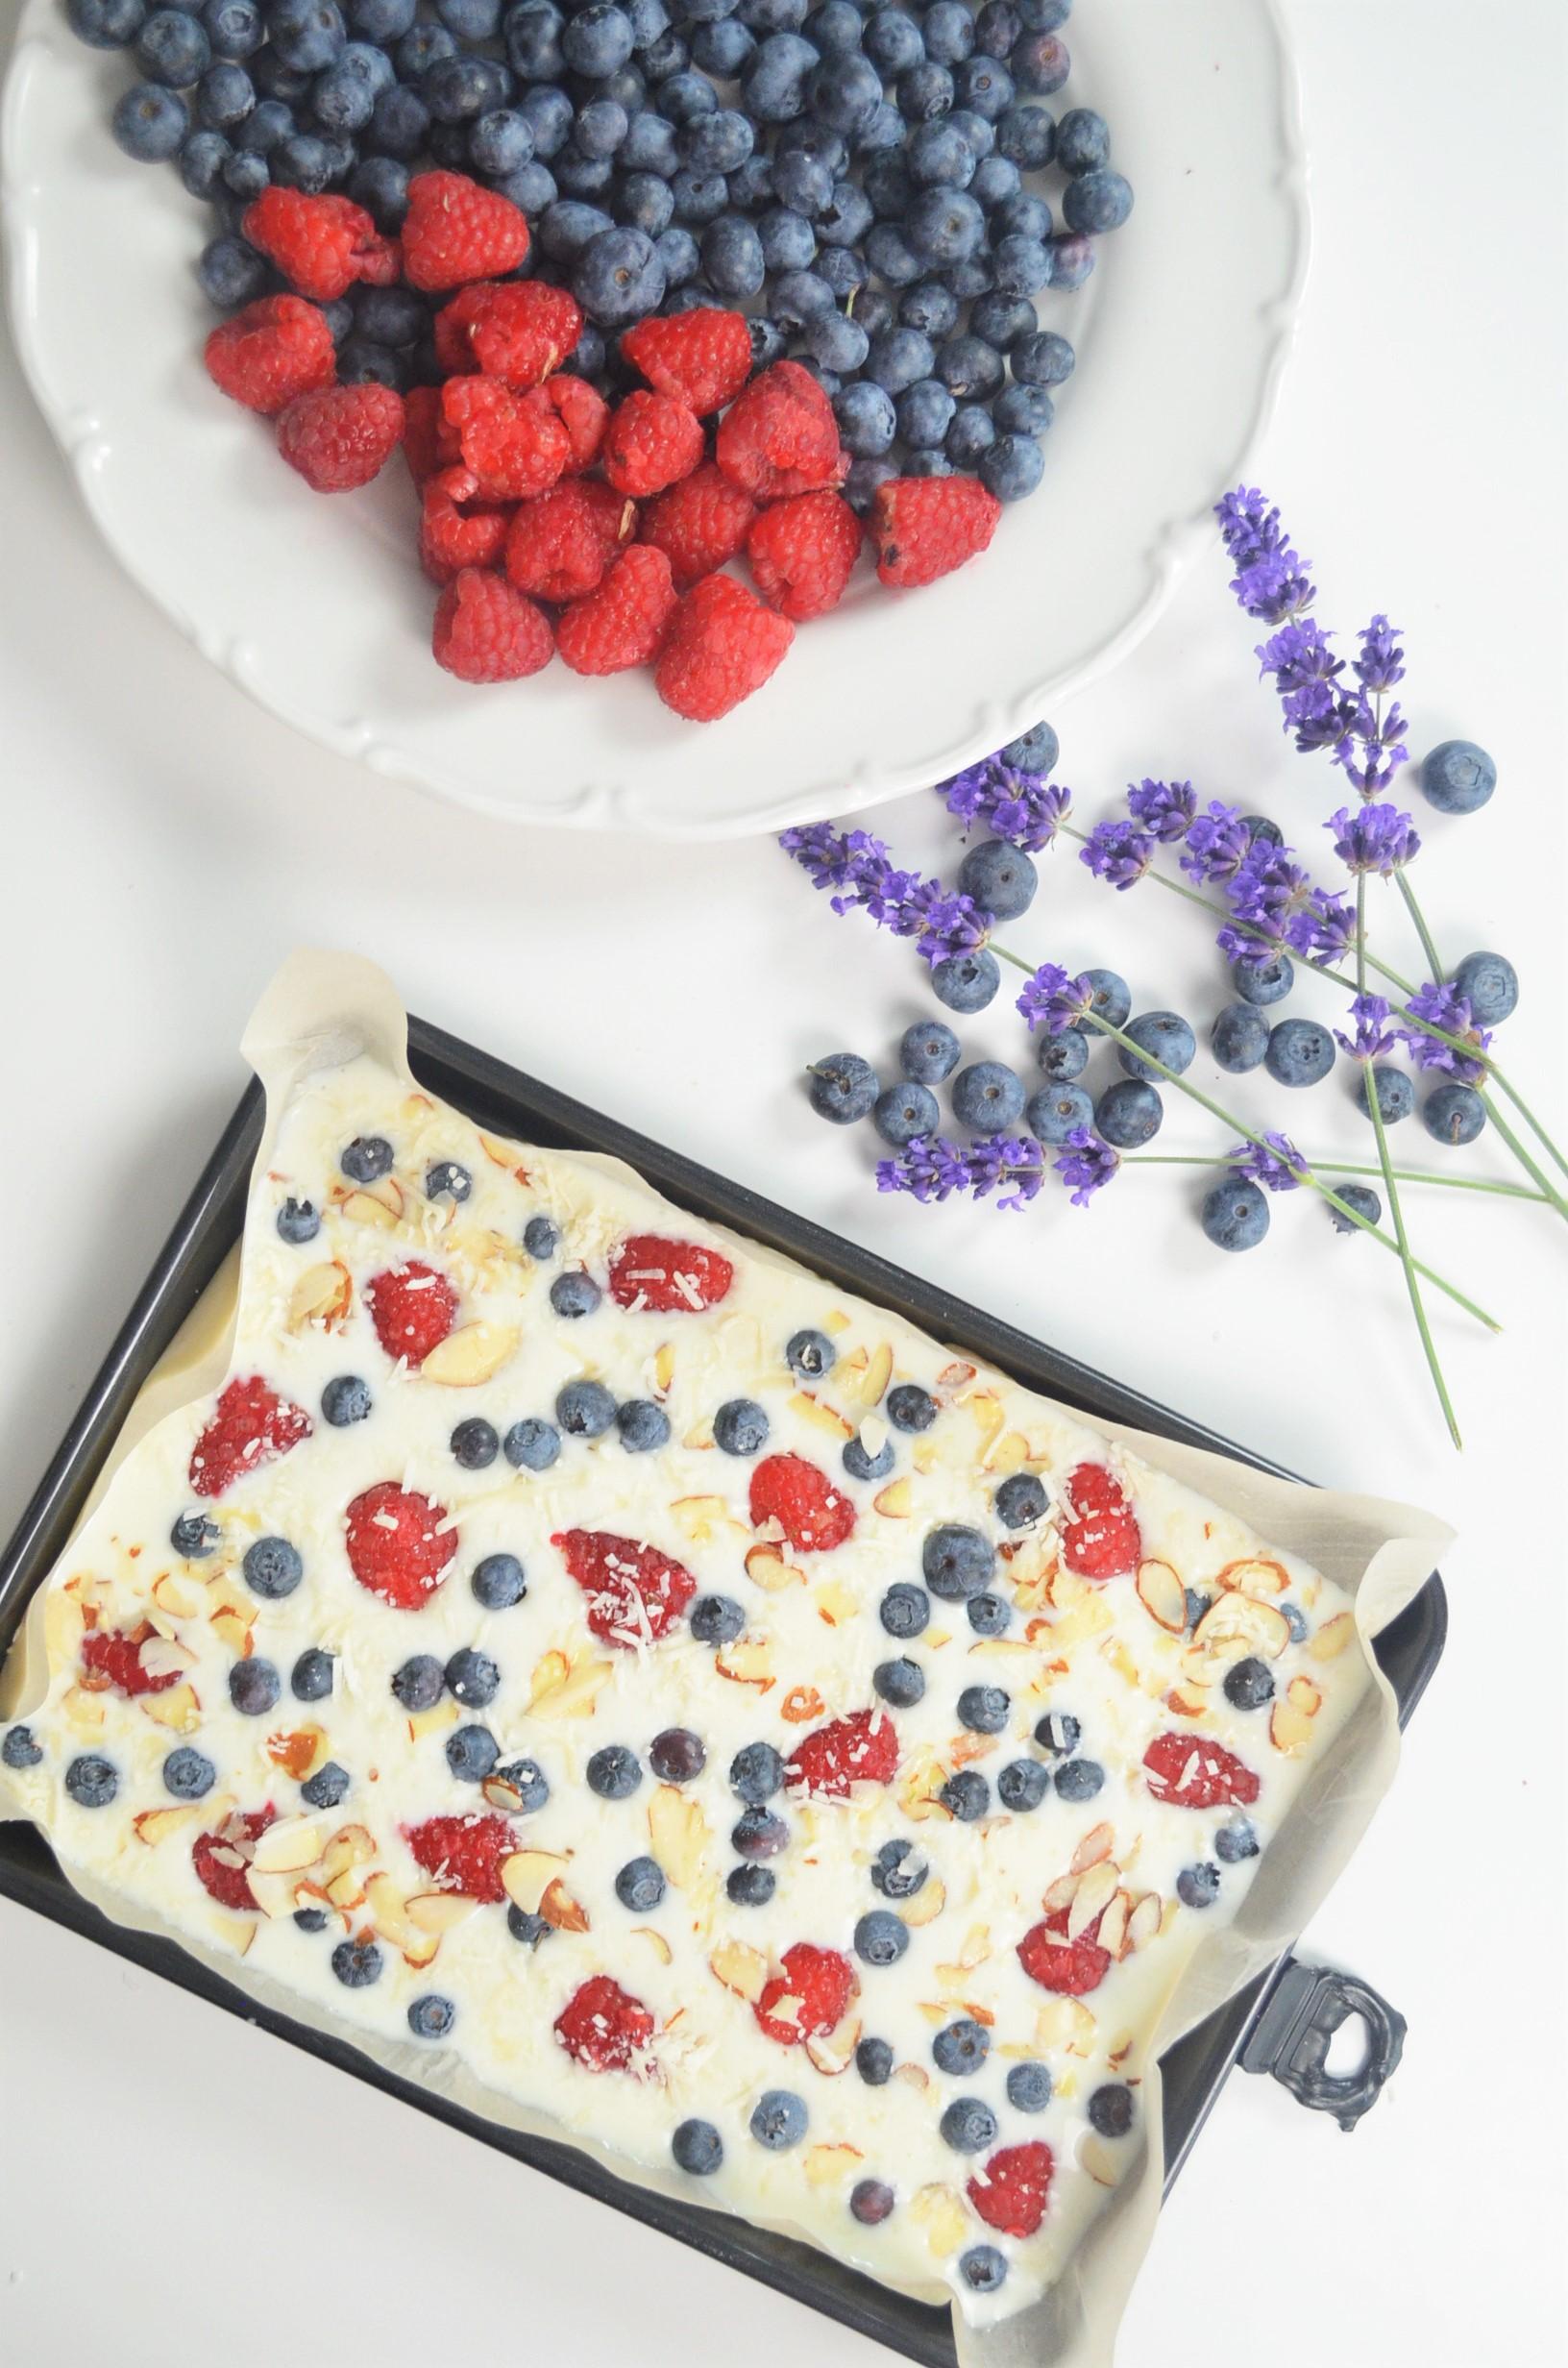 Berries and Almond Frozen Yogurt Bark